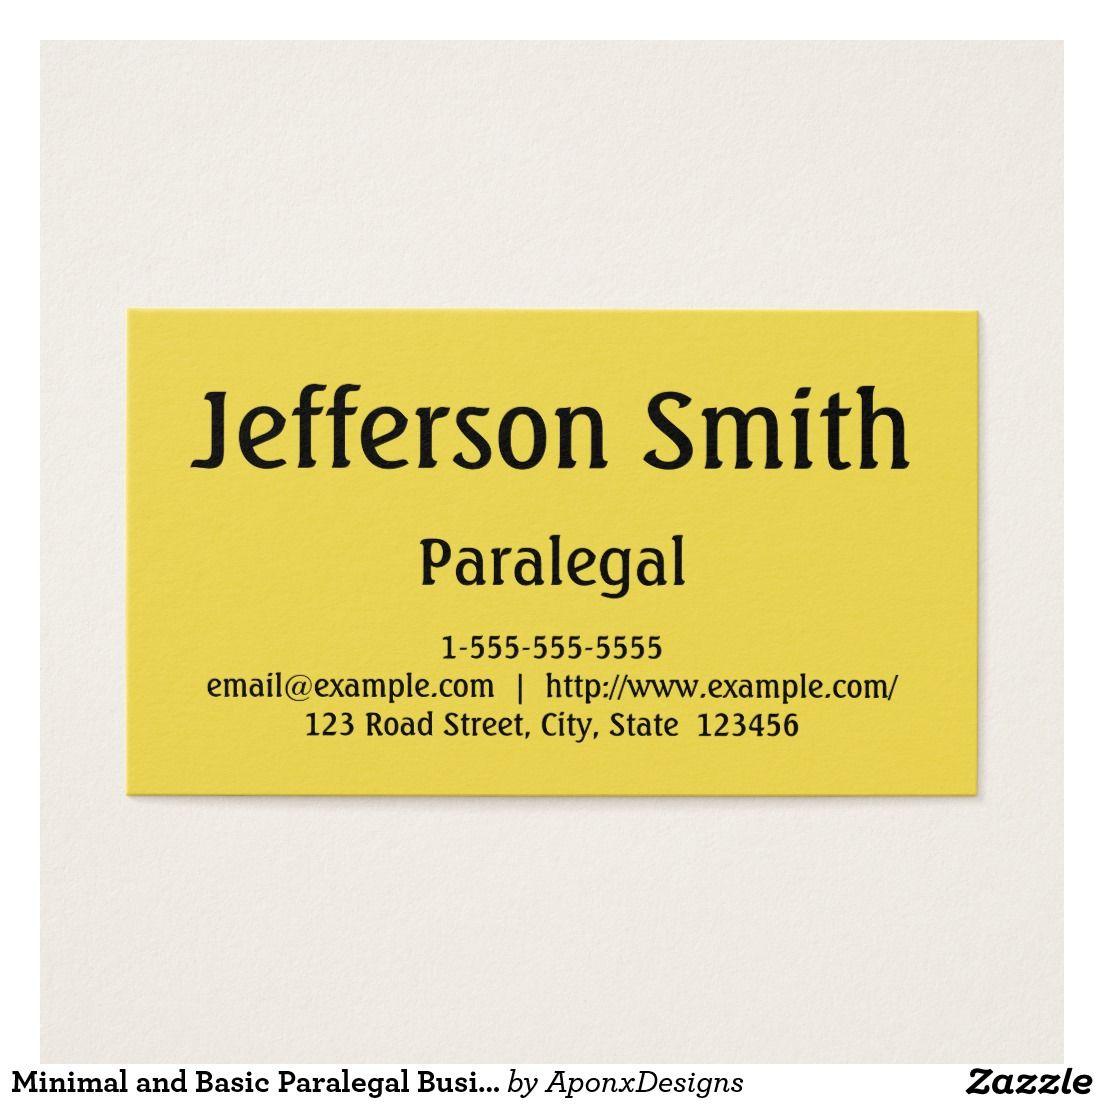 Minimal and basic paralegal business card paralegal business minimal and basic paralegal business card colourmoves